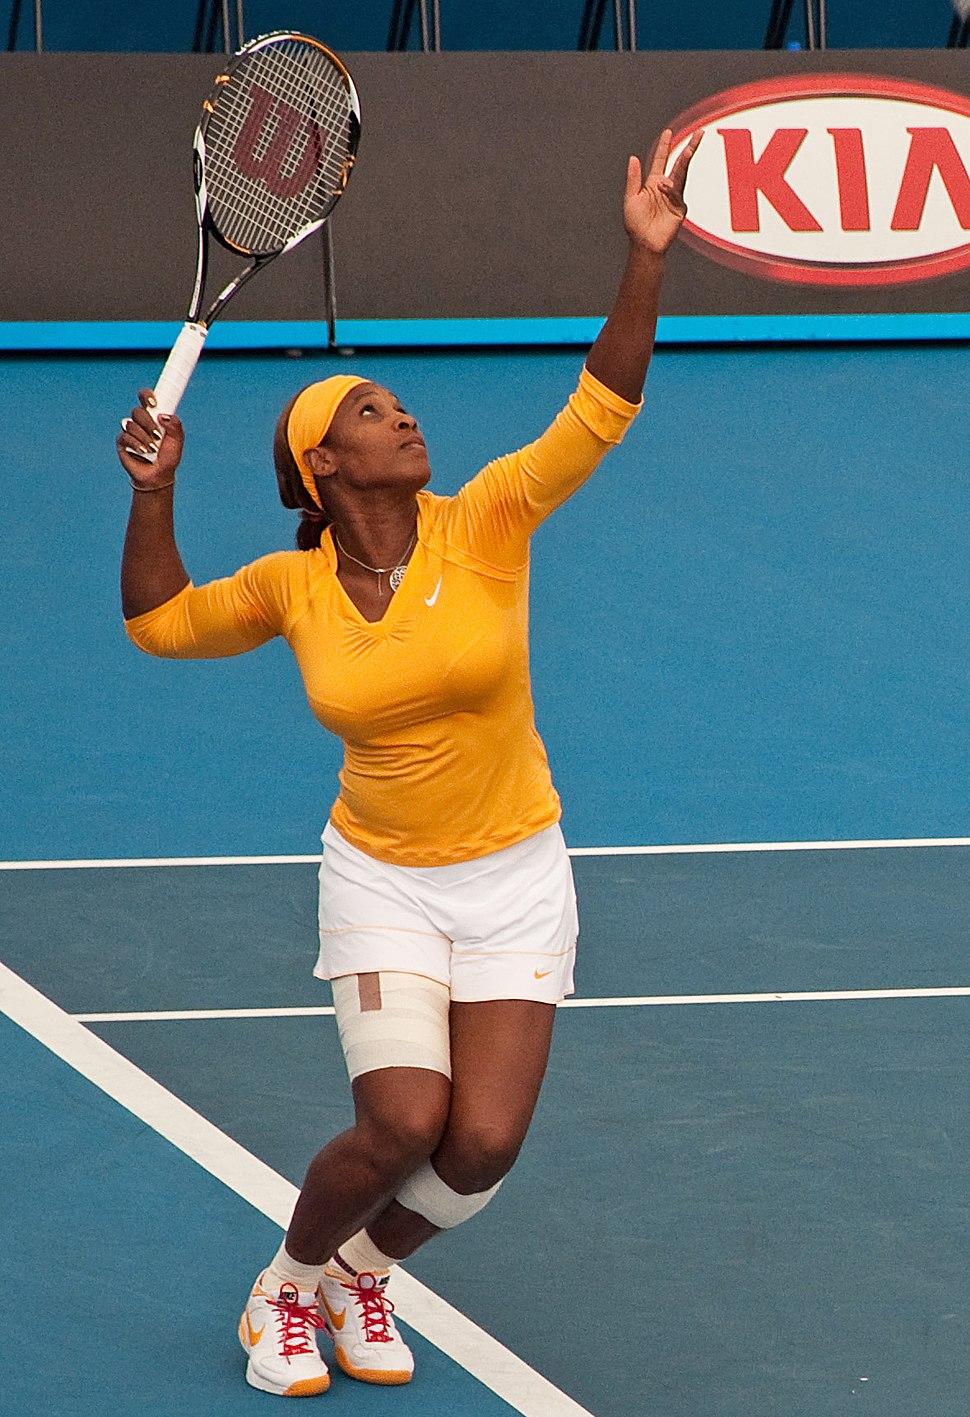 Melbourne Australian Open 2010 Serena Serve.jpg